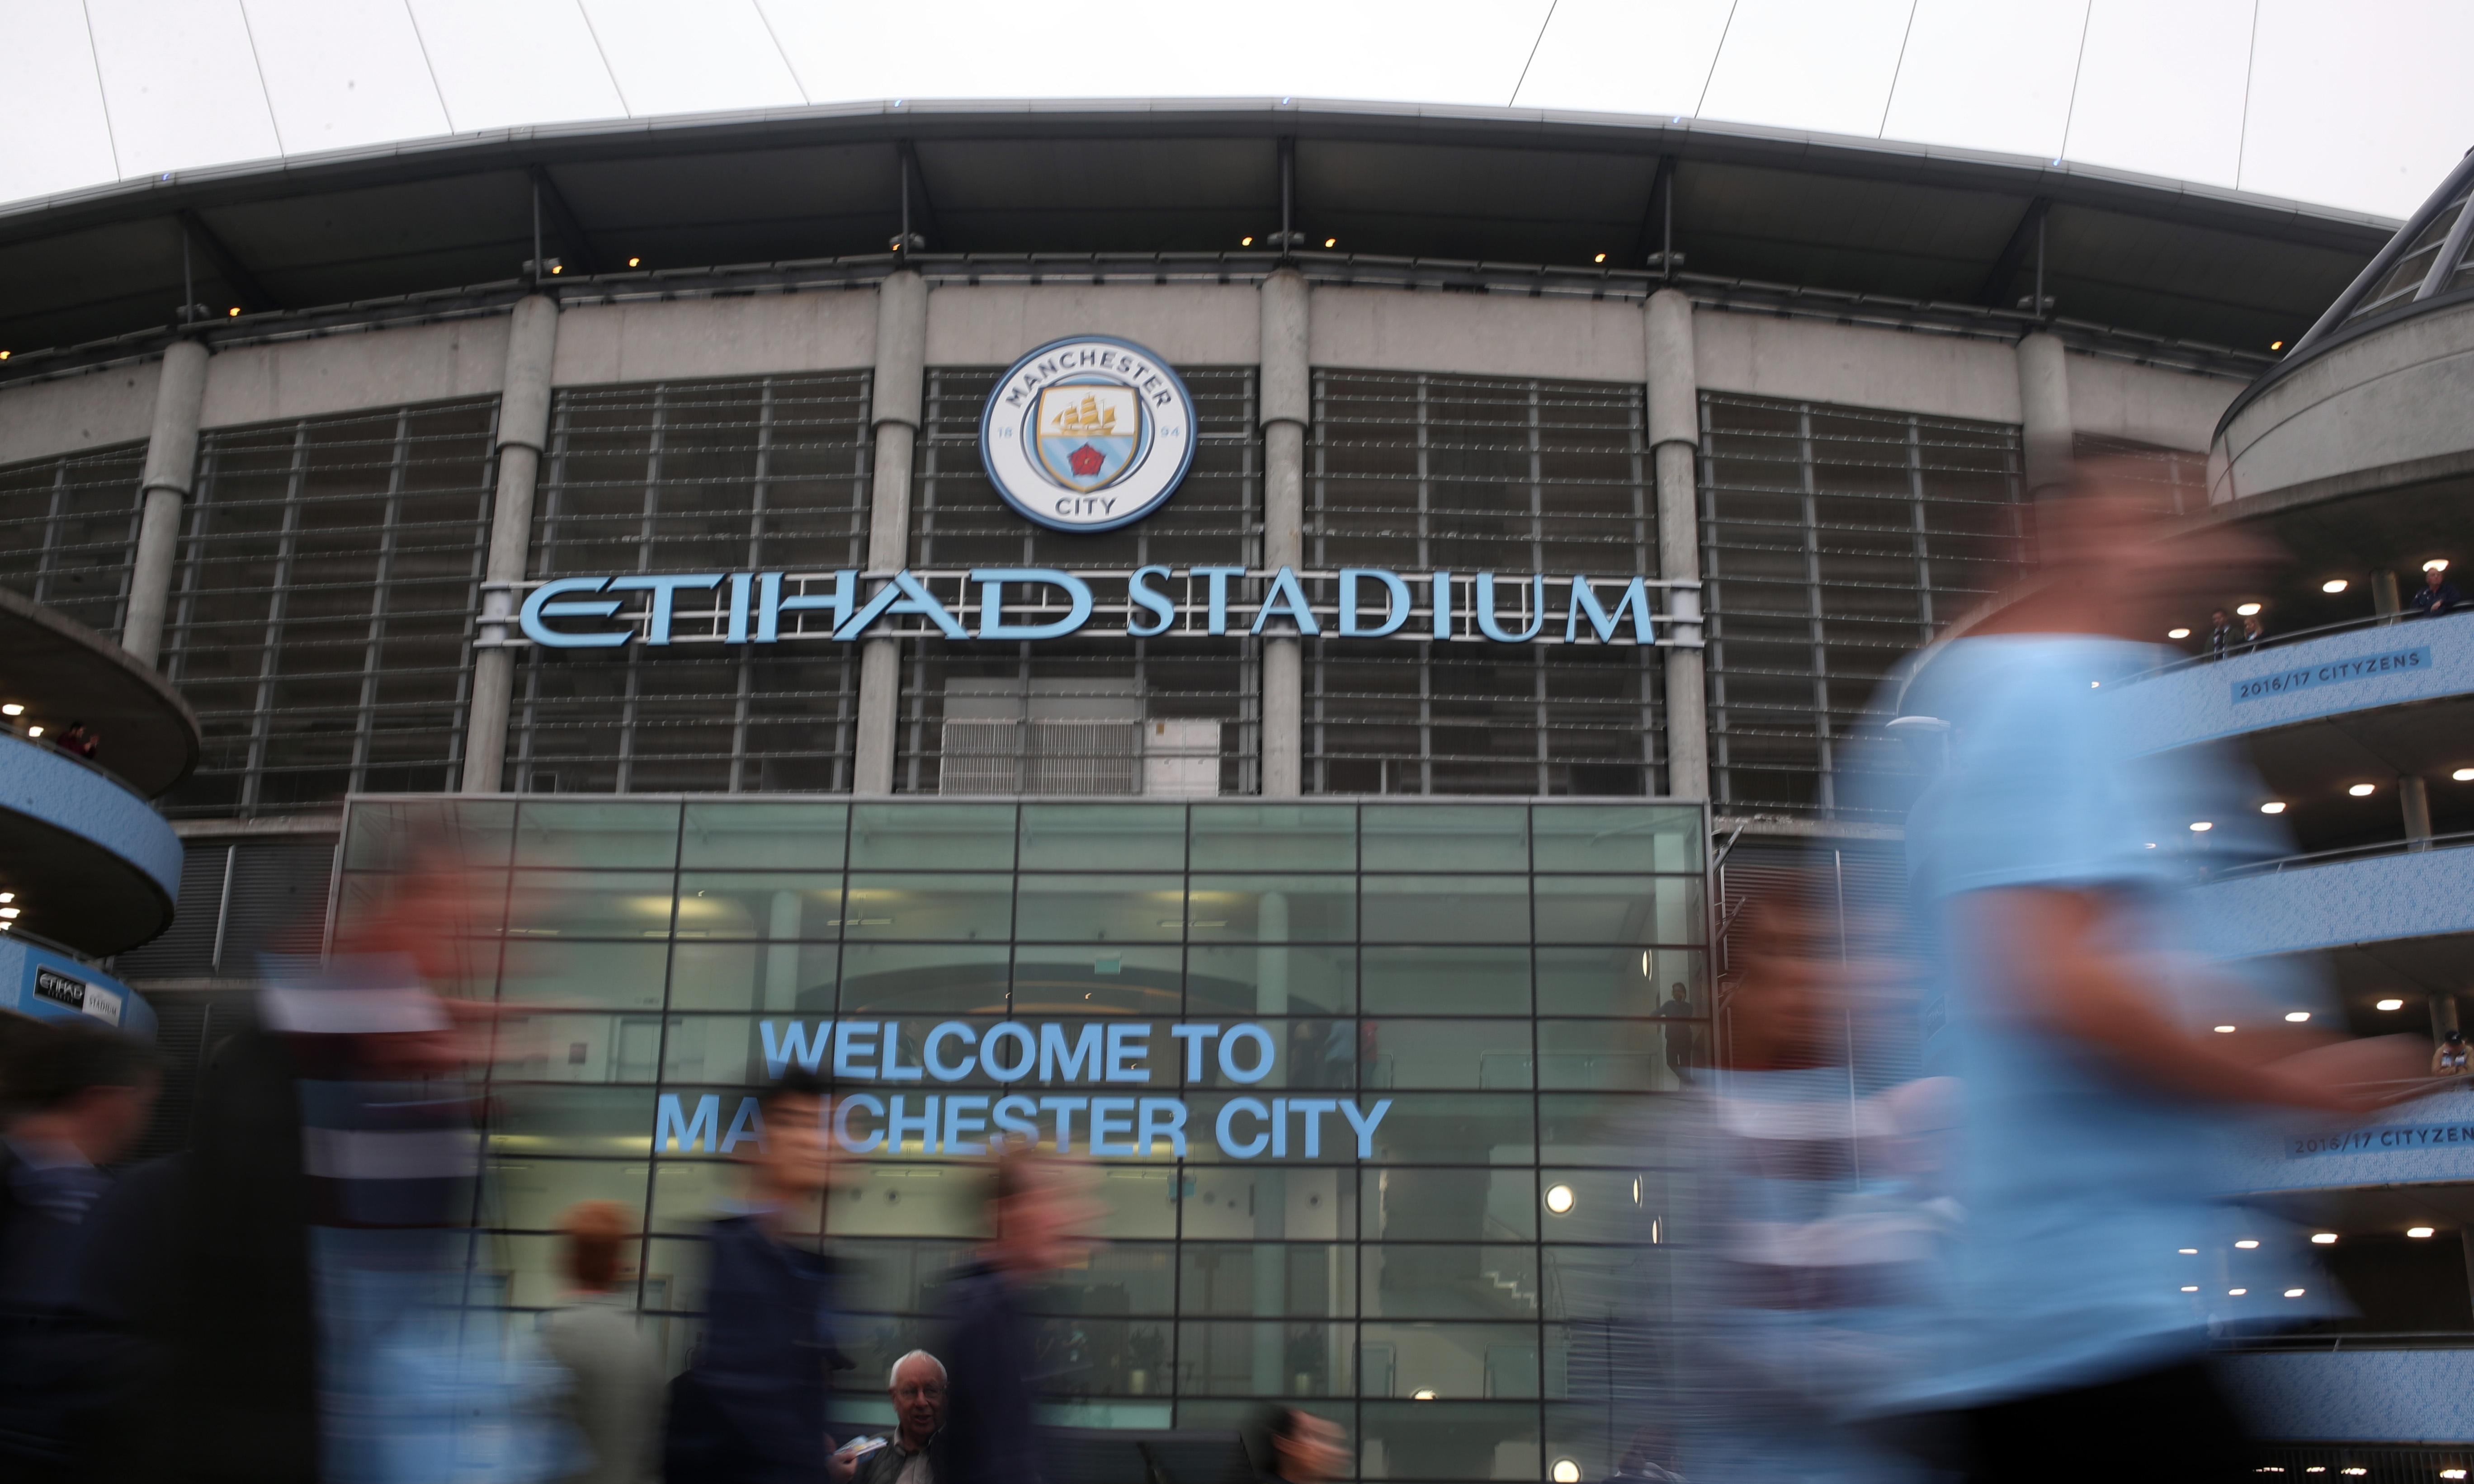 Manchester City face calls to reconsider facial recognition tech